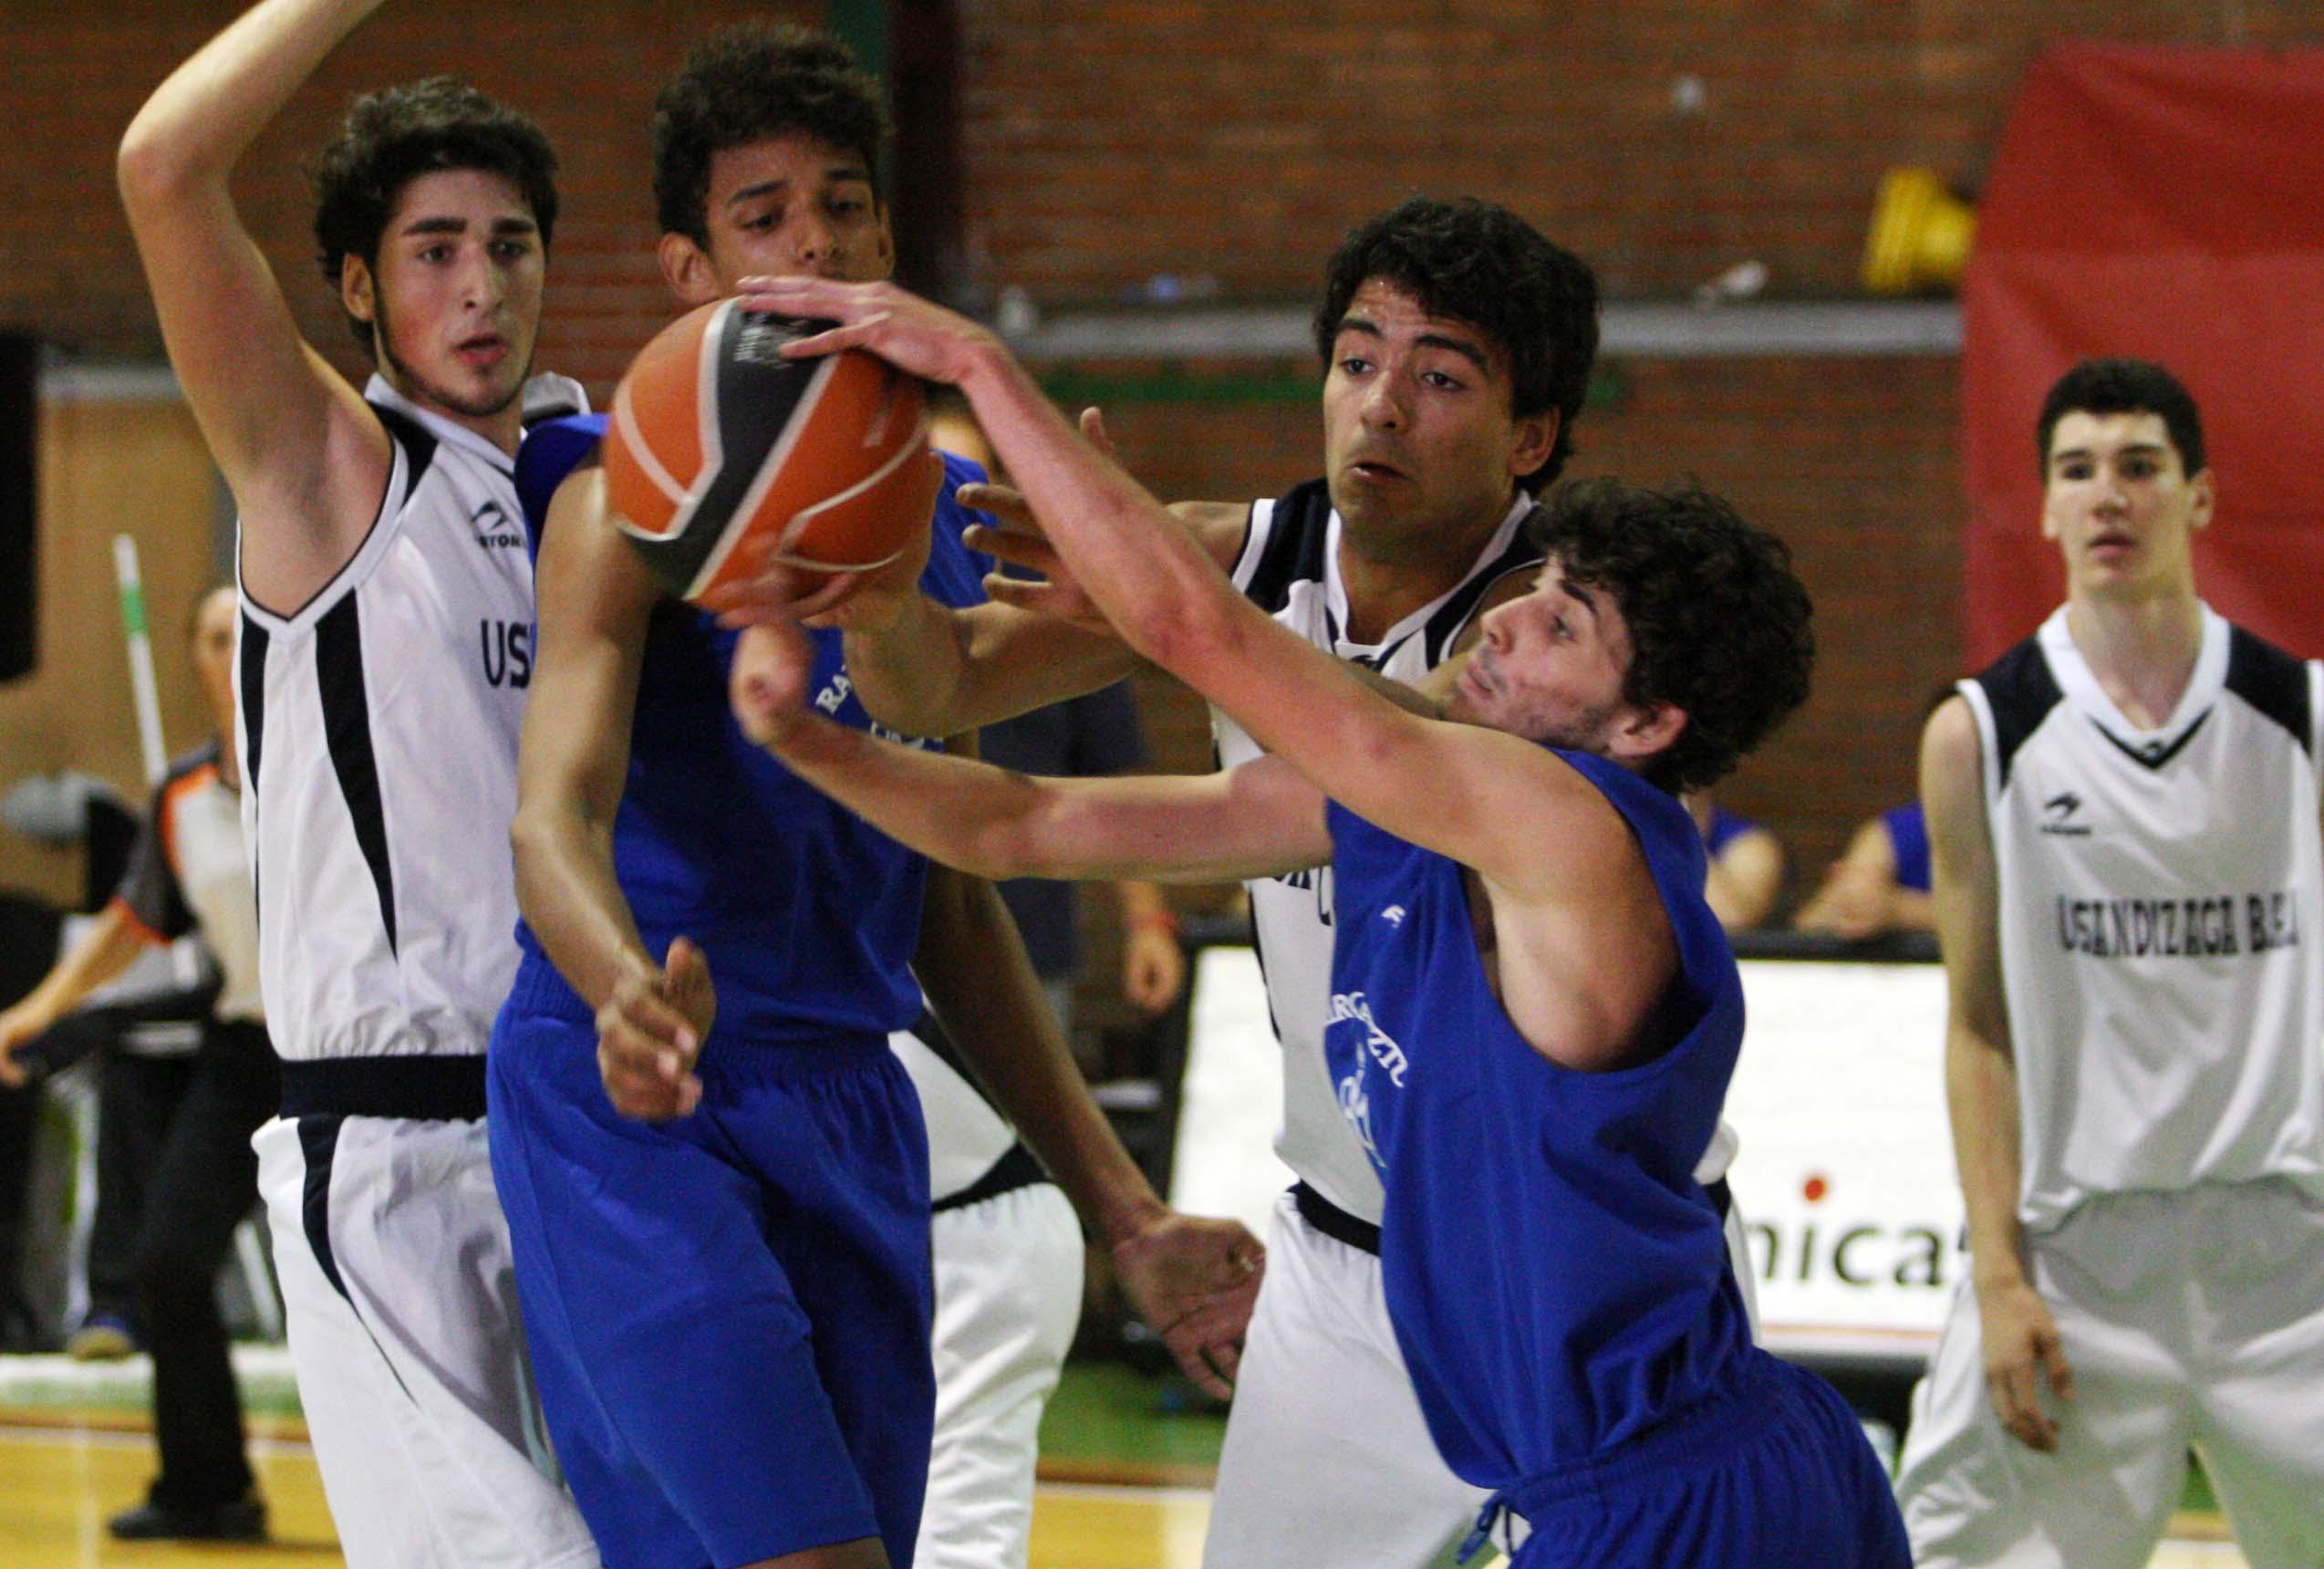 [VIDEO] Usandizaga remontó al Ramiro en la final de Series Colegiales ACB